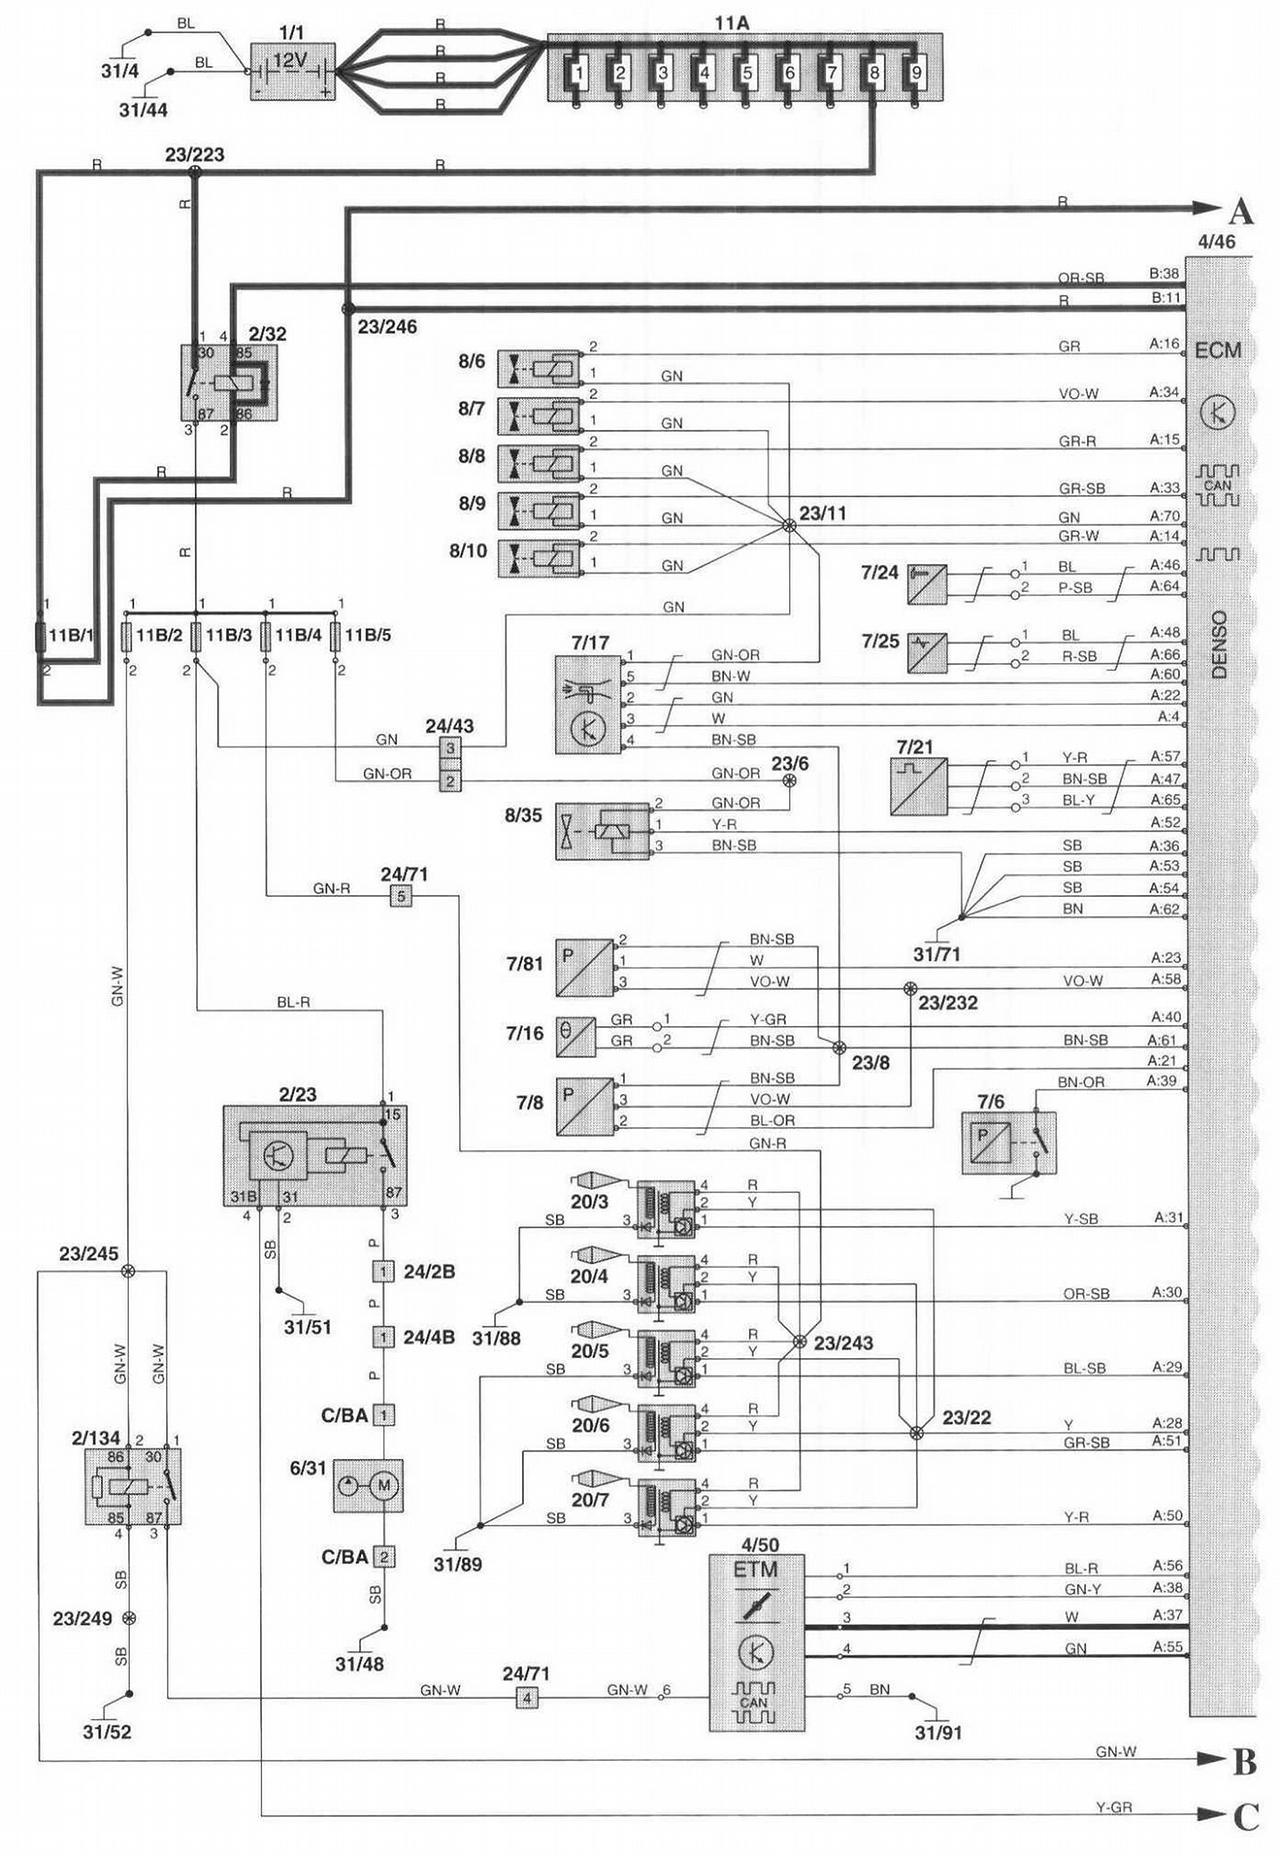 1989 Wellcraft Wiring Diagram Ford 02 Sensor Wiring Diagram Begeboy Wiring Diagram Source